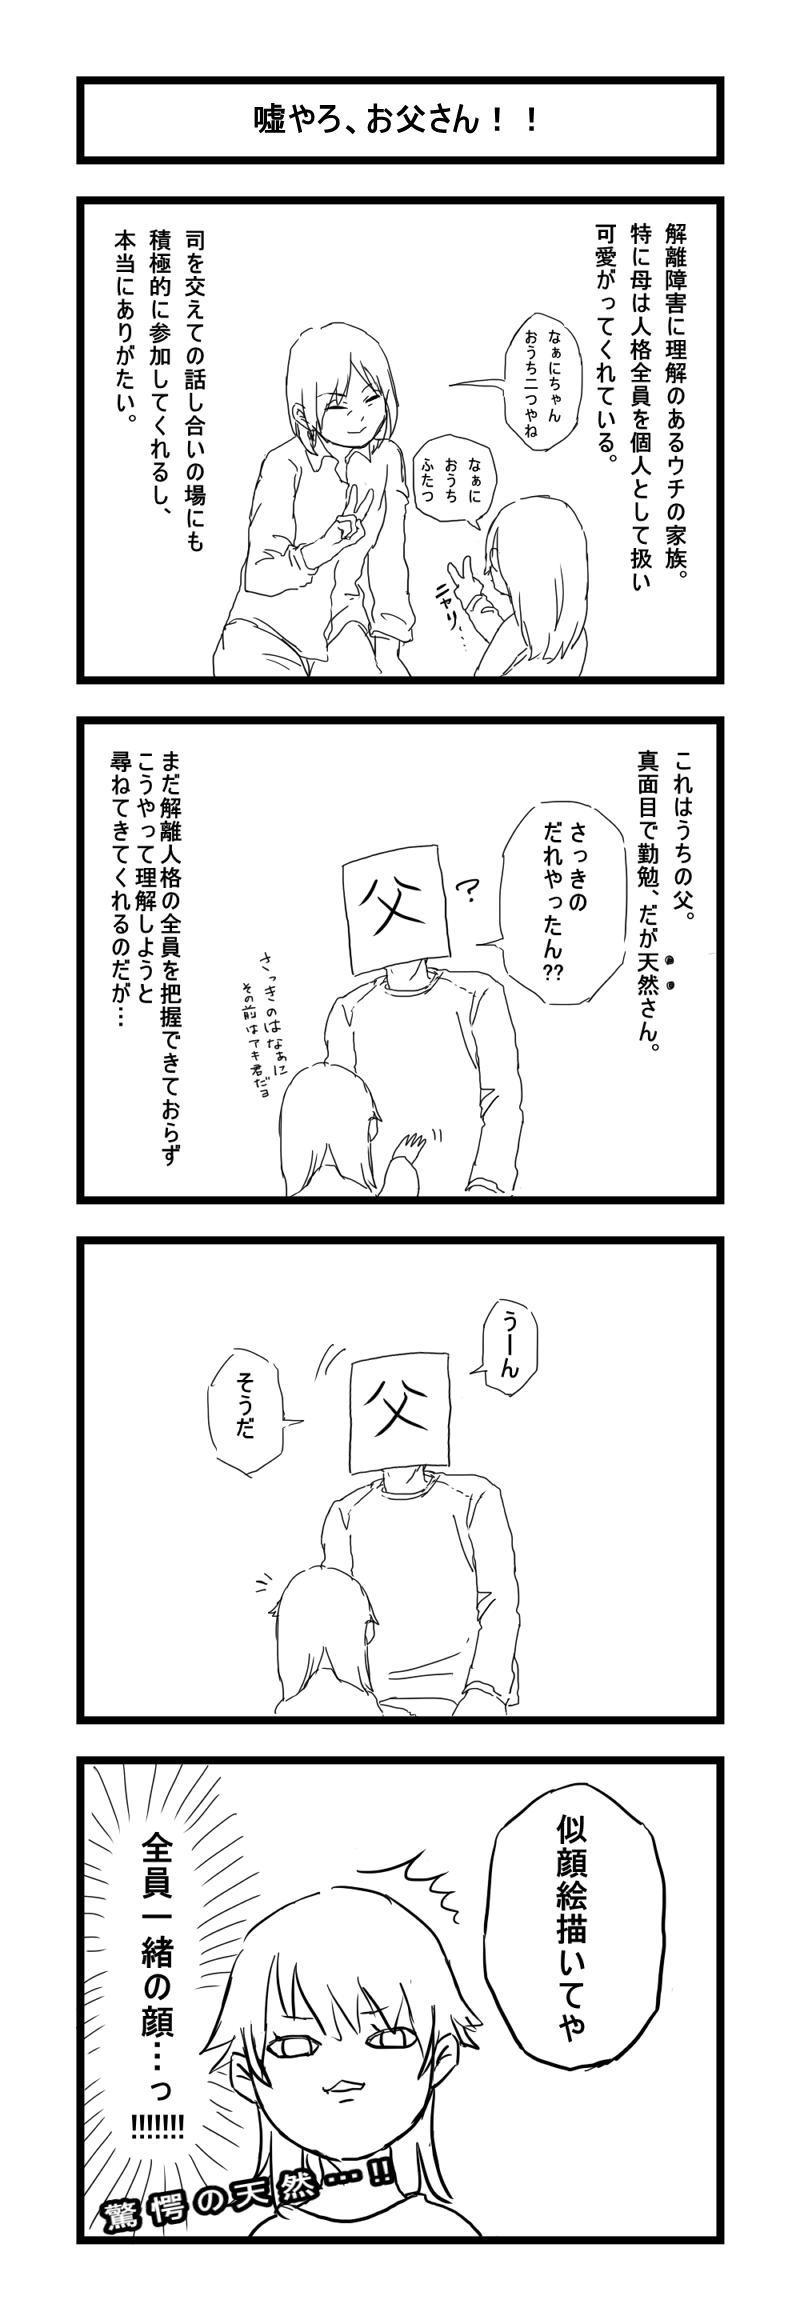 chiyoyotatino-10281112-1.png